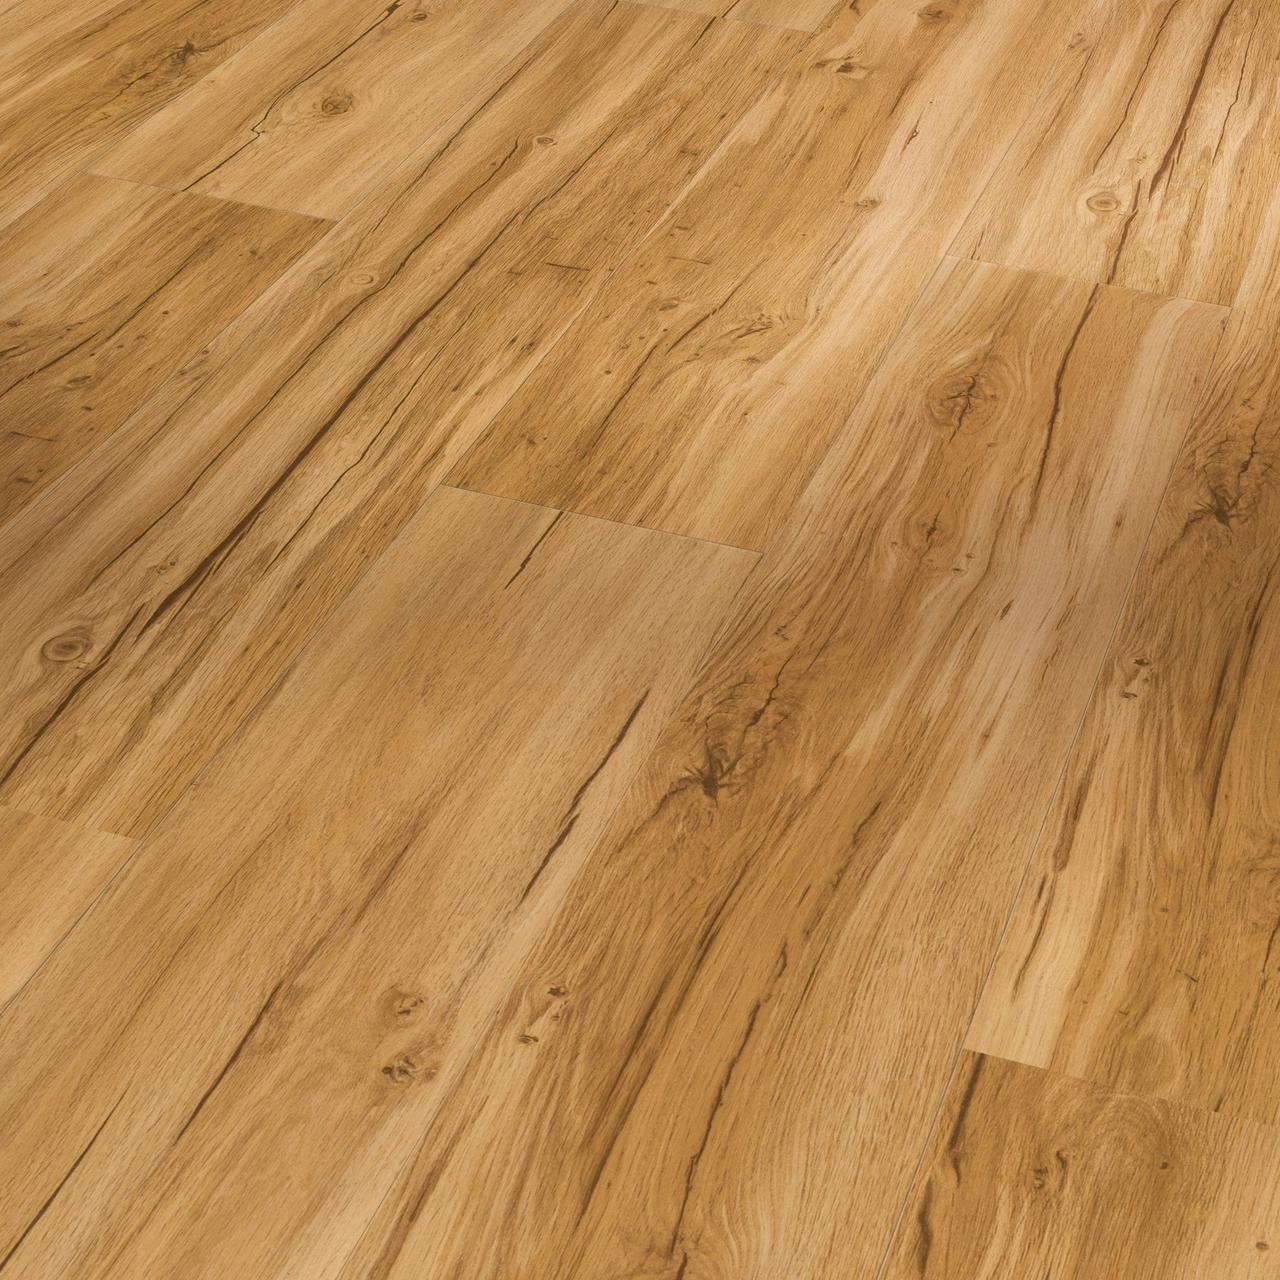 Вінілові покриття Parador Дуб мэмори натуральний браш (Oak Memory natural brushed texture)